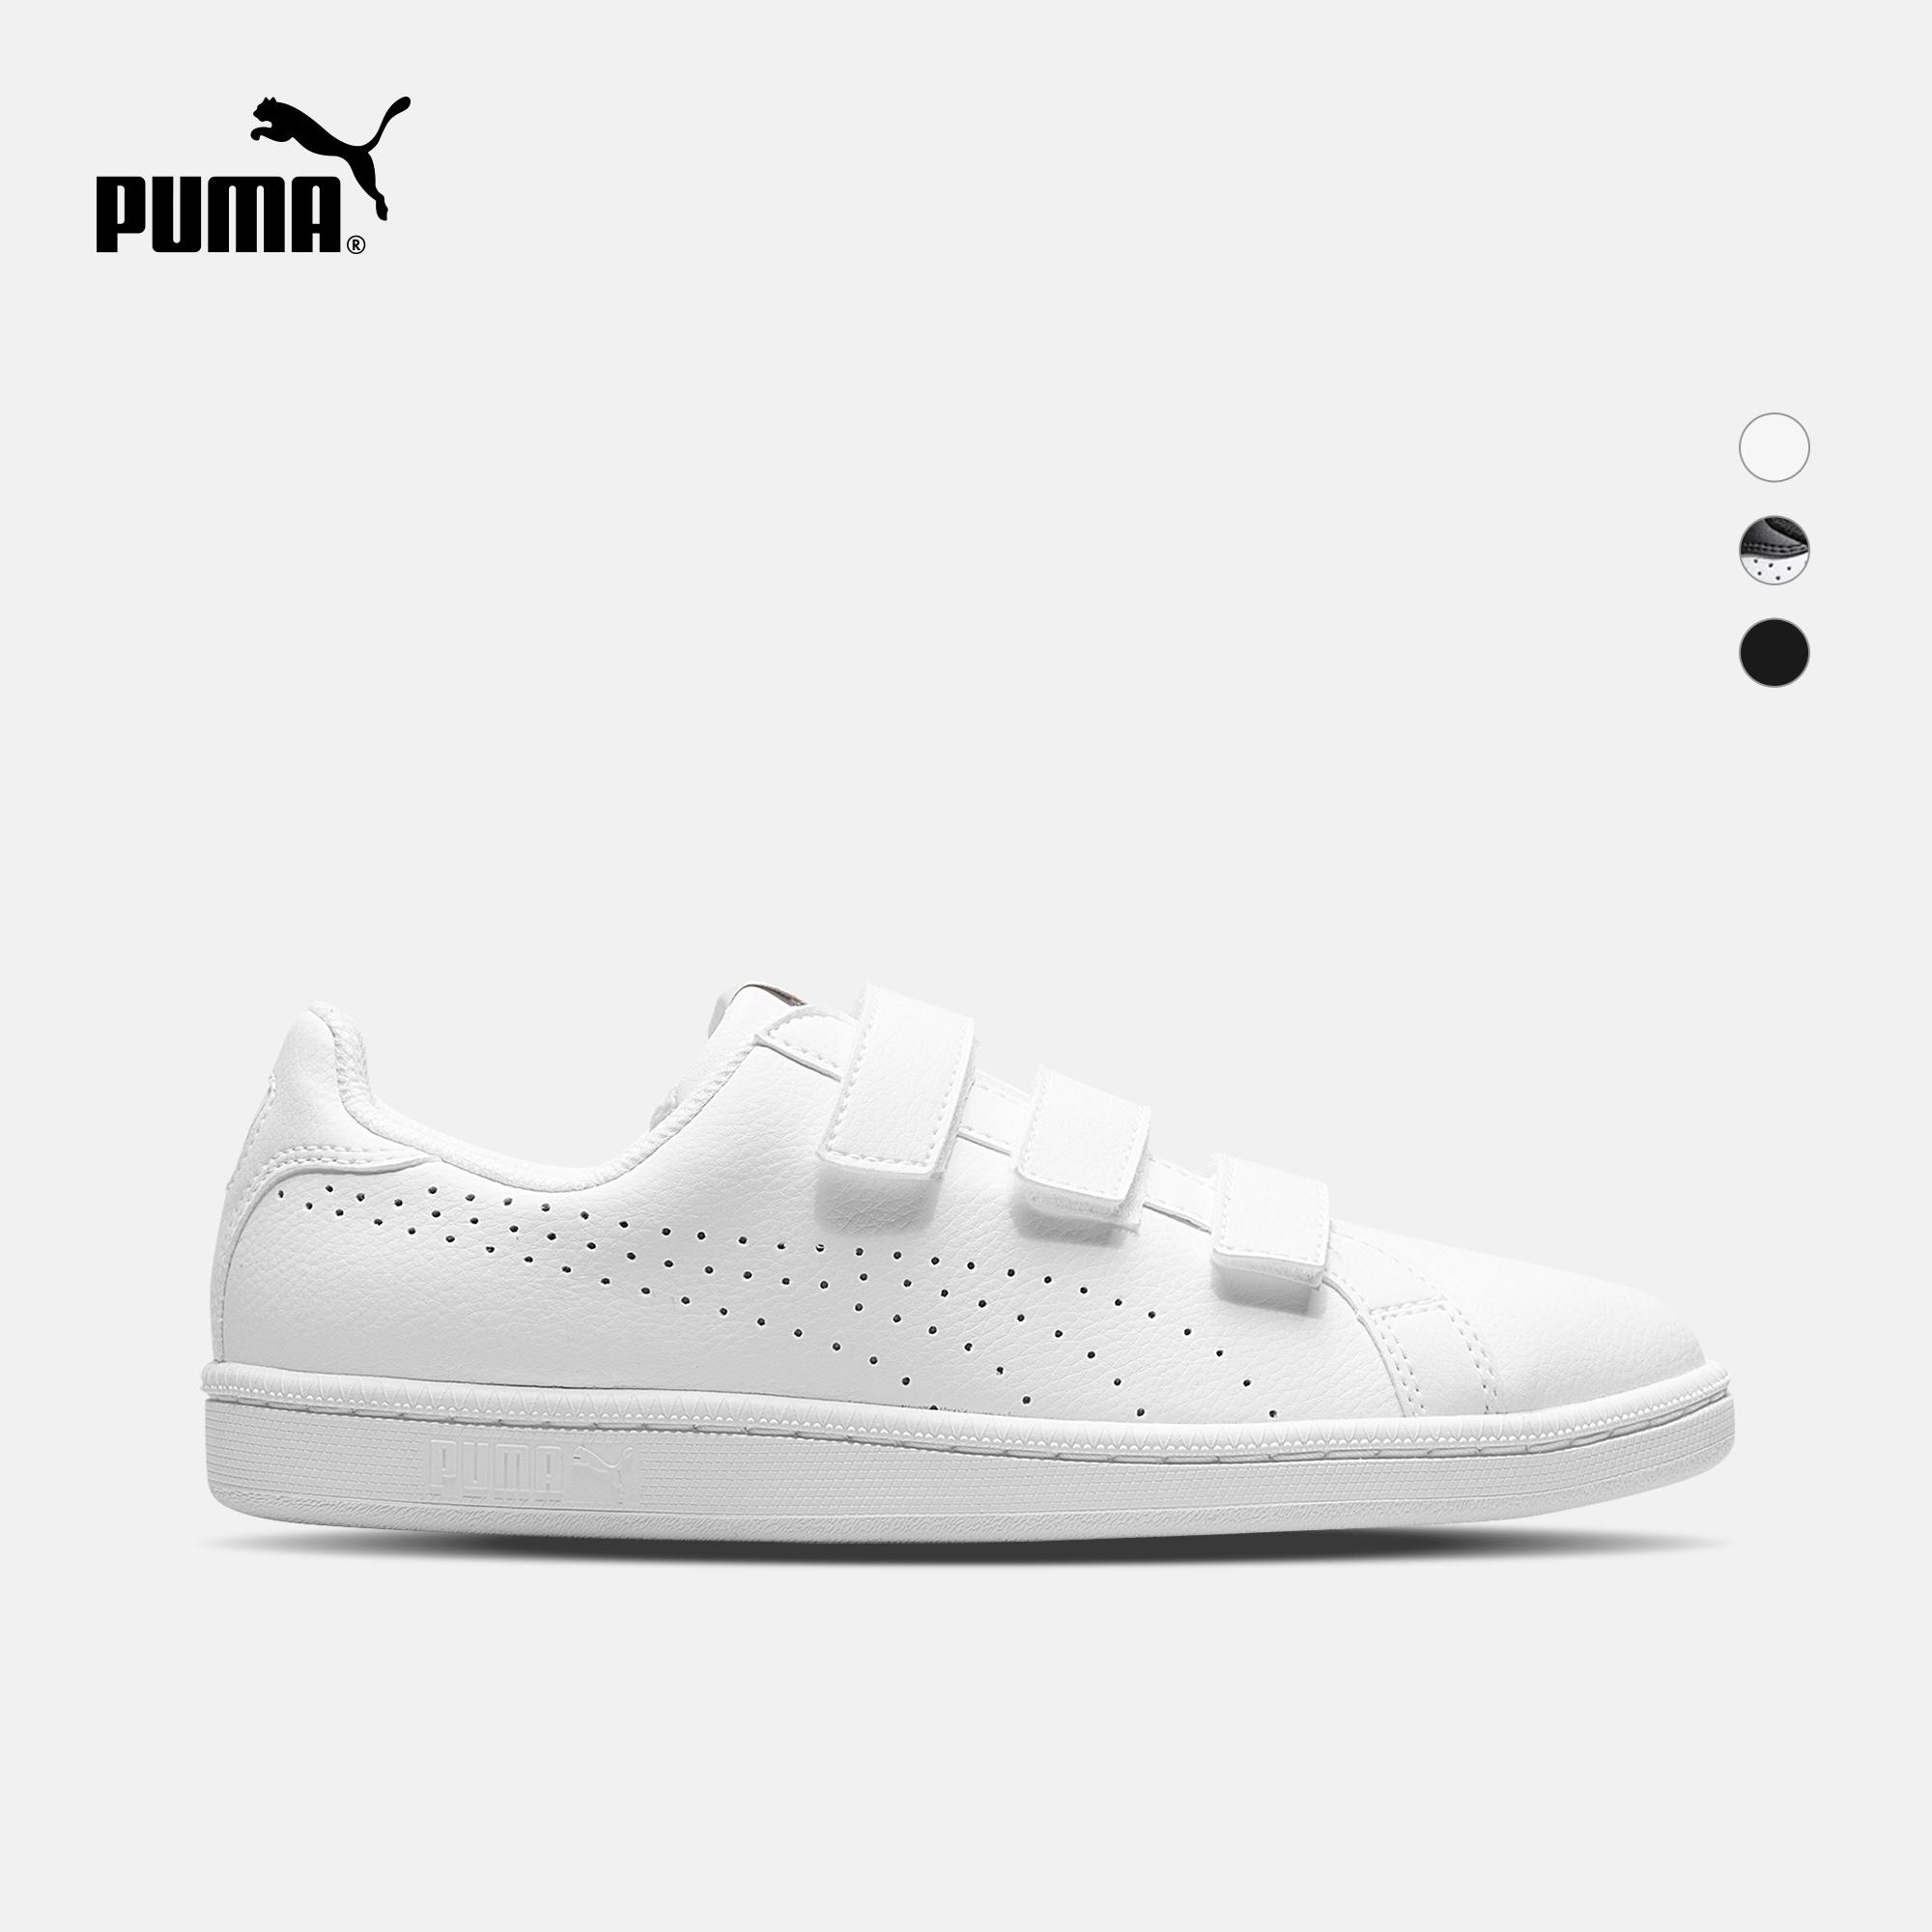 PUMA彪马官方 男女同款休闲鞋 Smash 363723